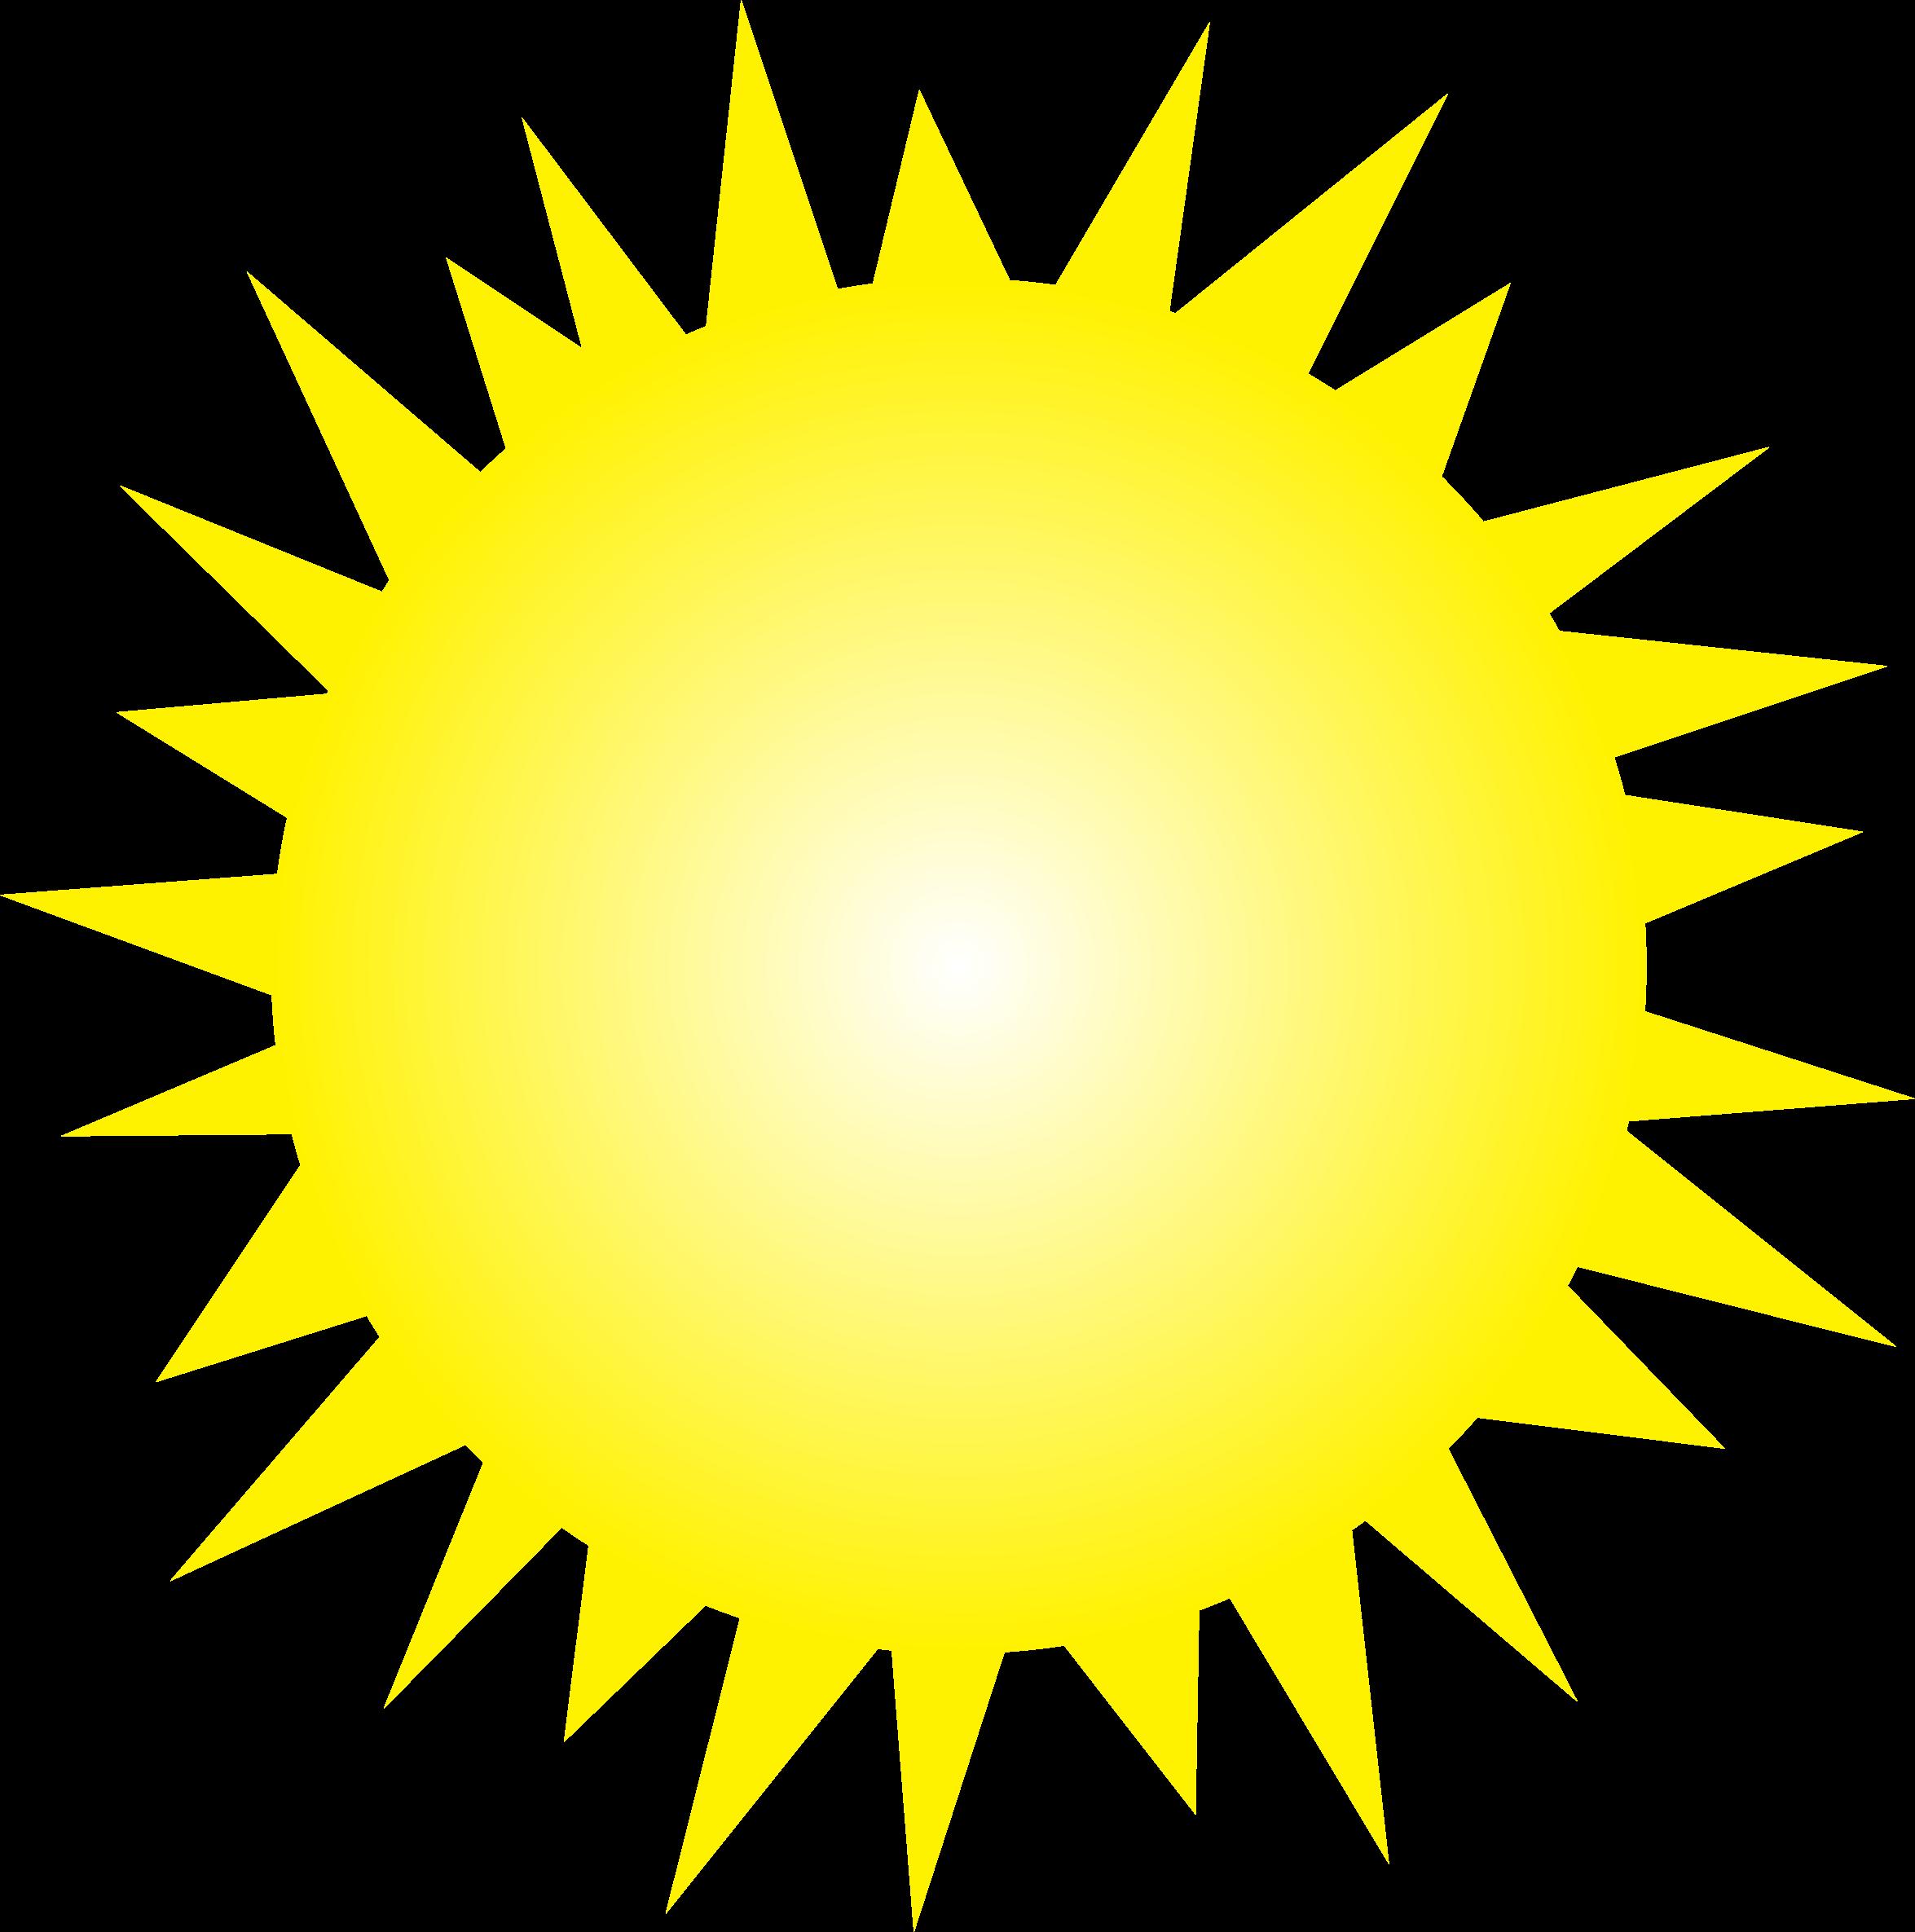 Free Sun Shining Png, Download Free Clip Art, Free Clip Art.